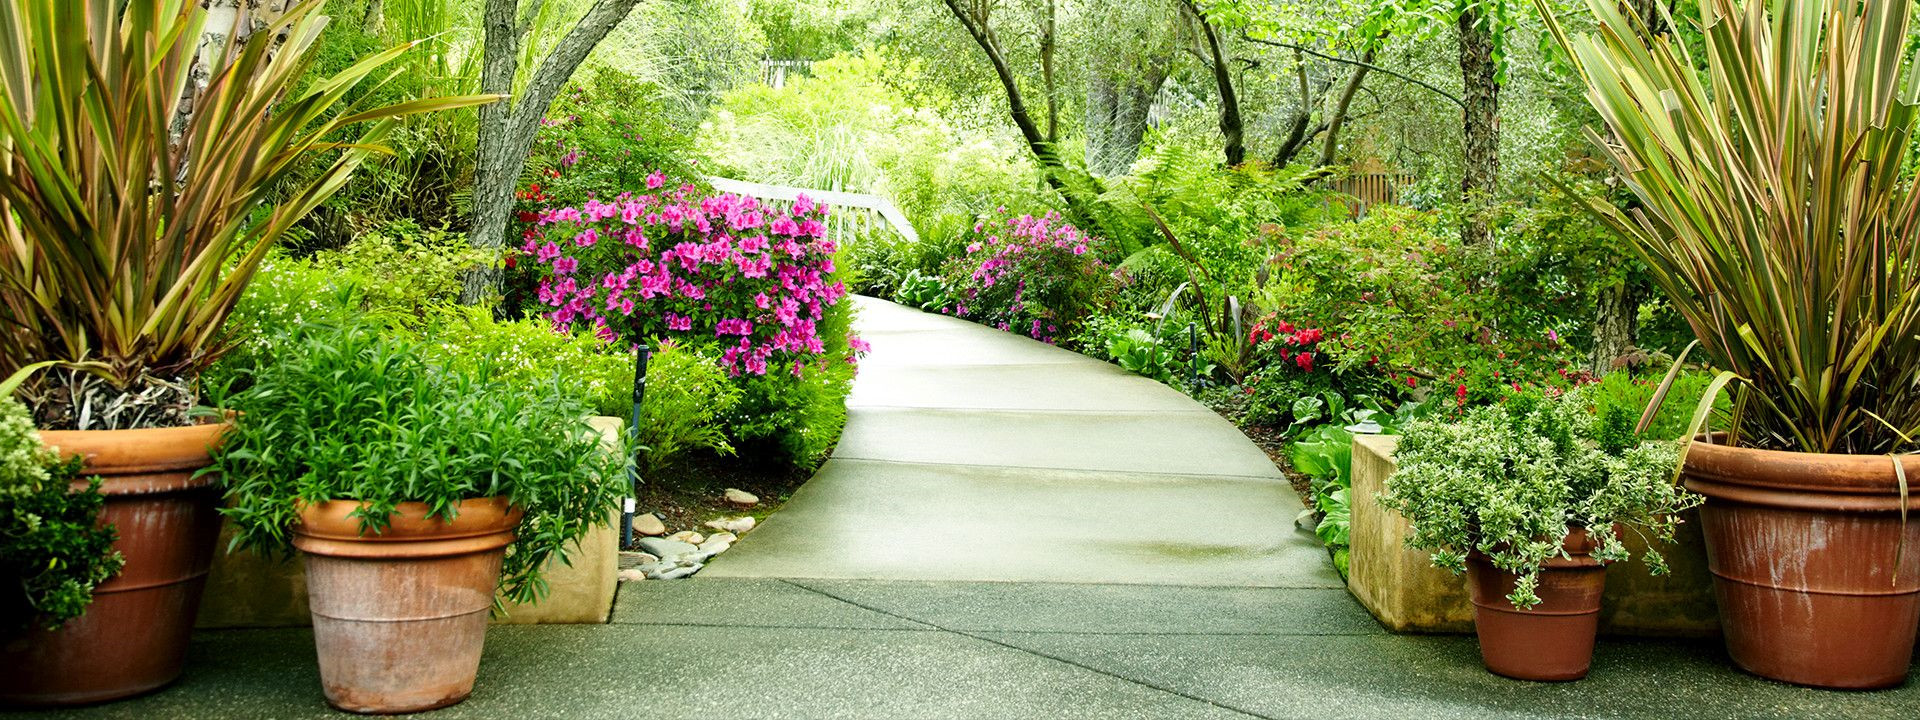 Resources   Rewalt-Peshek Funeral Home & Cremation Services